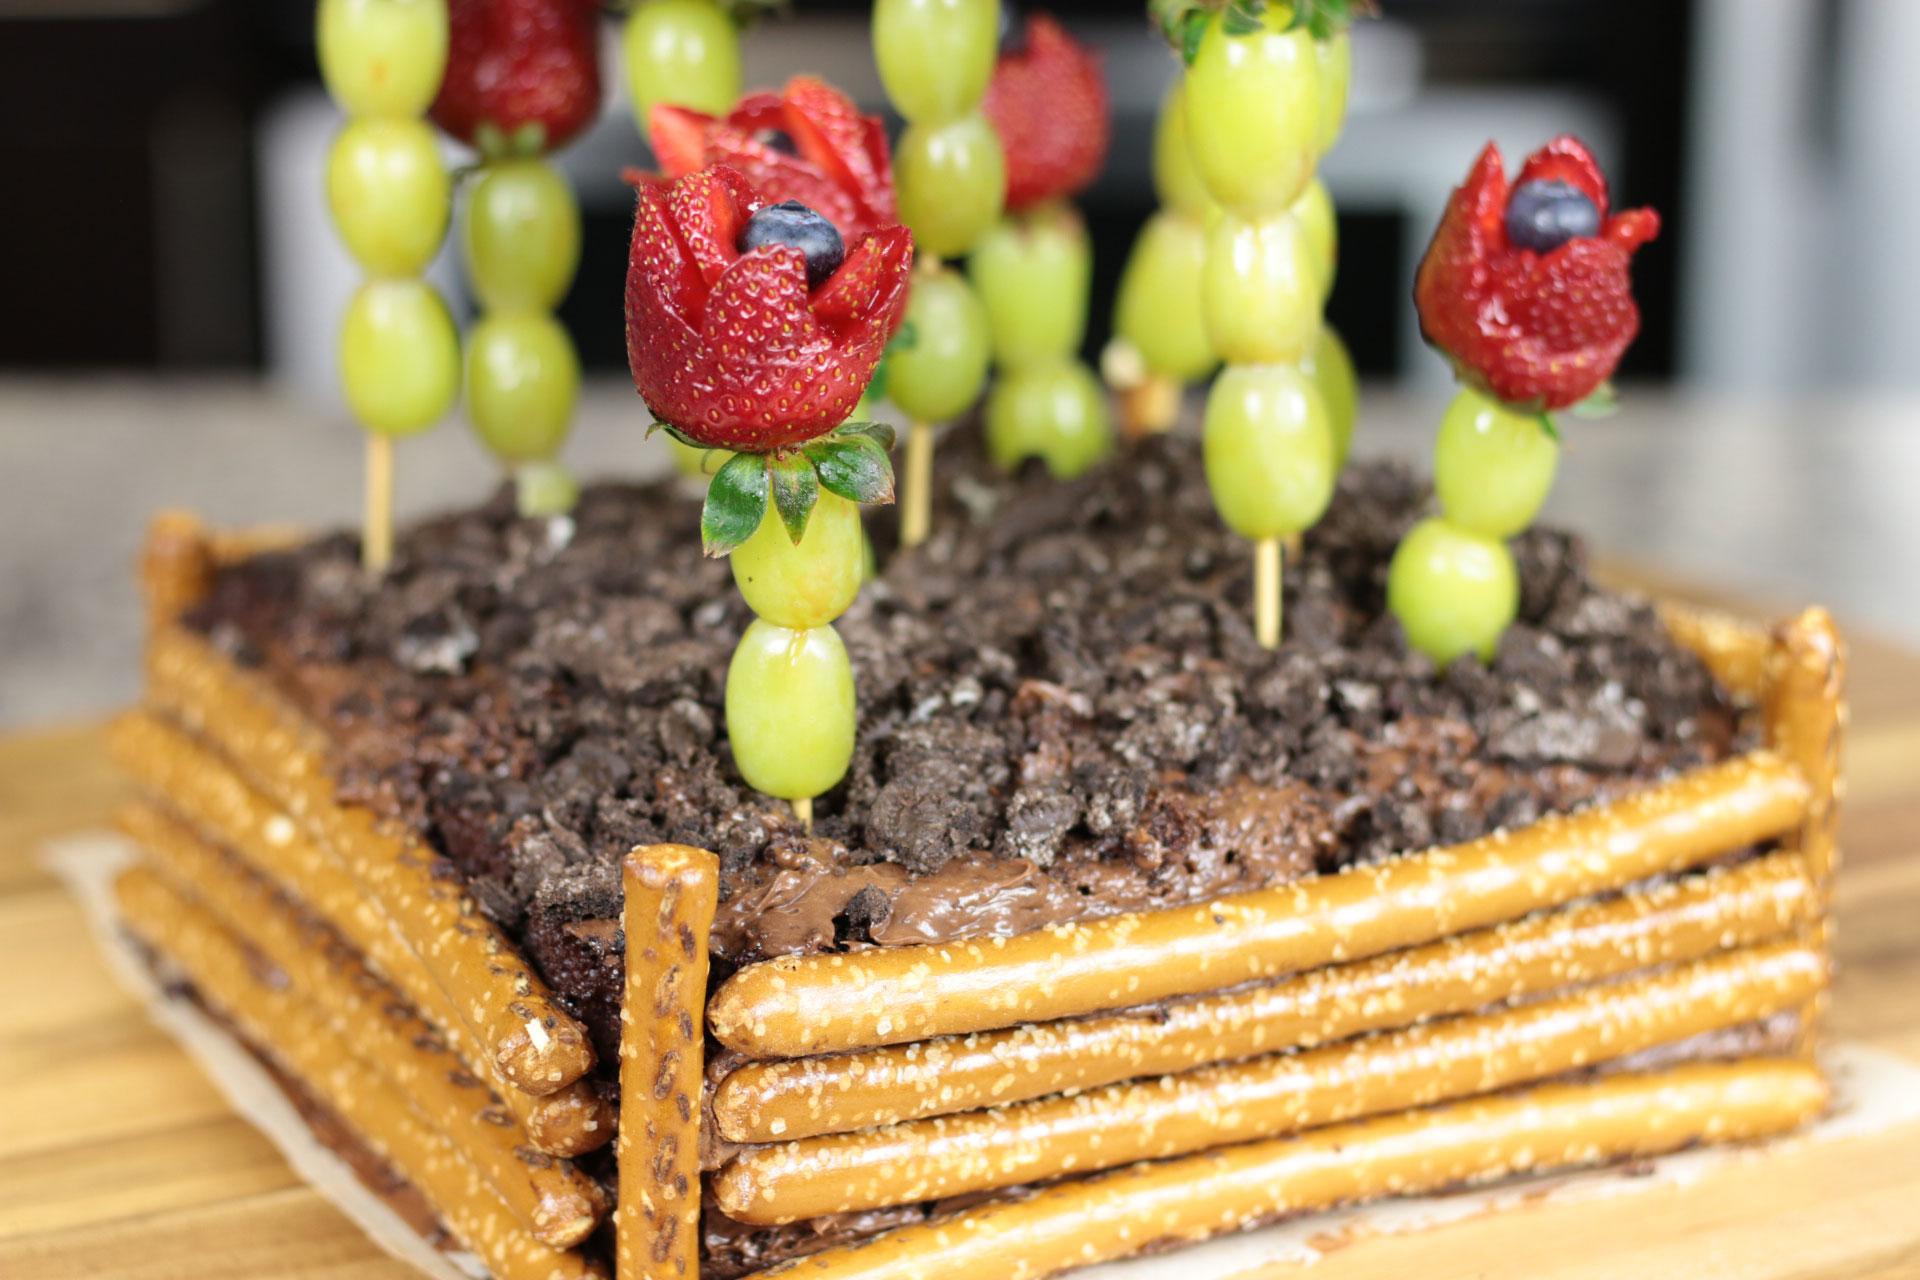 Mother's Day Dessert Ideas (Chocolate Garden & Strawberry Roses)